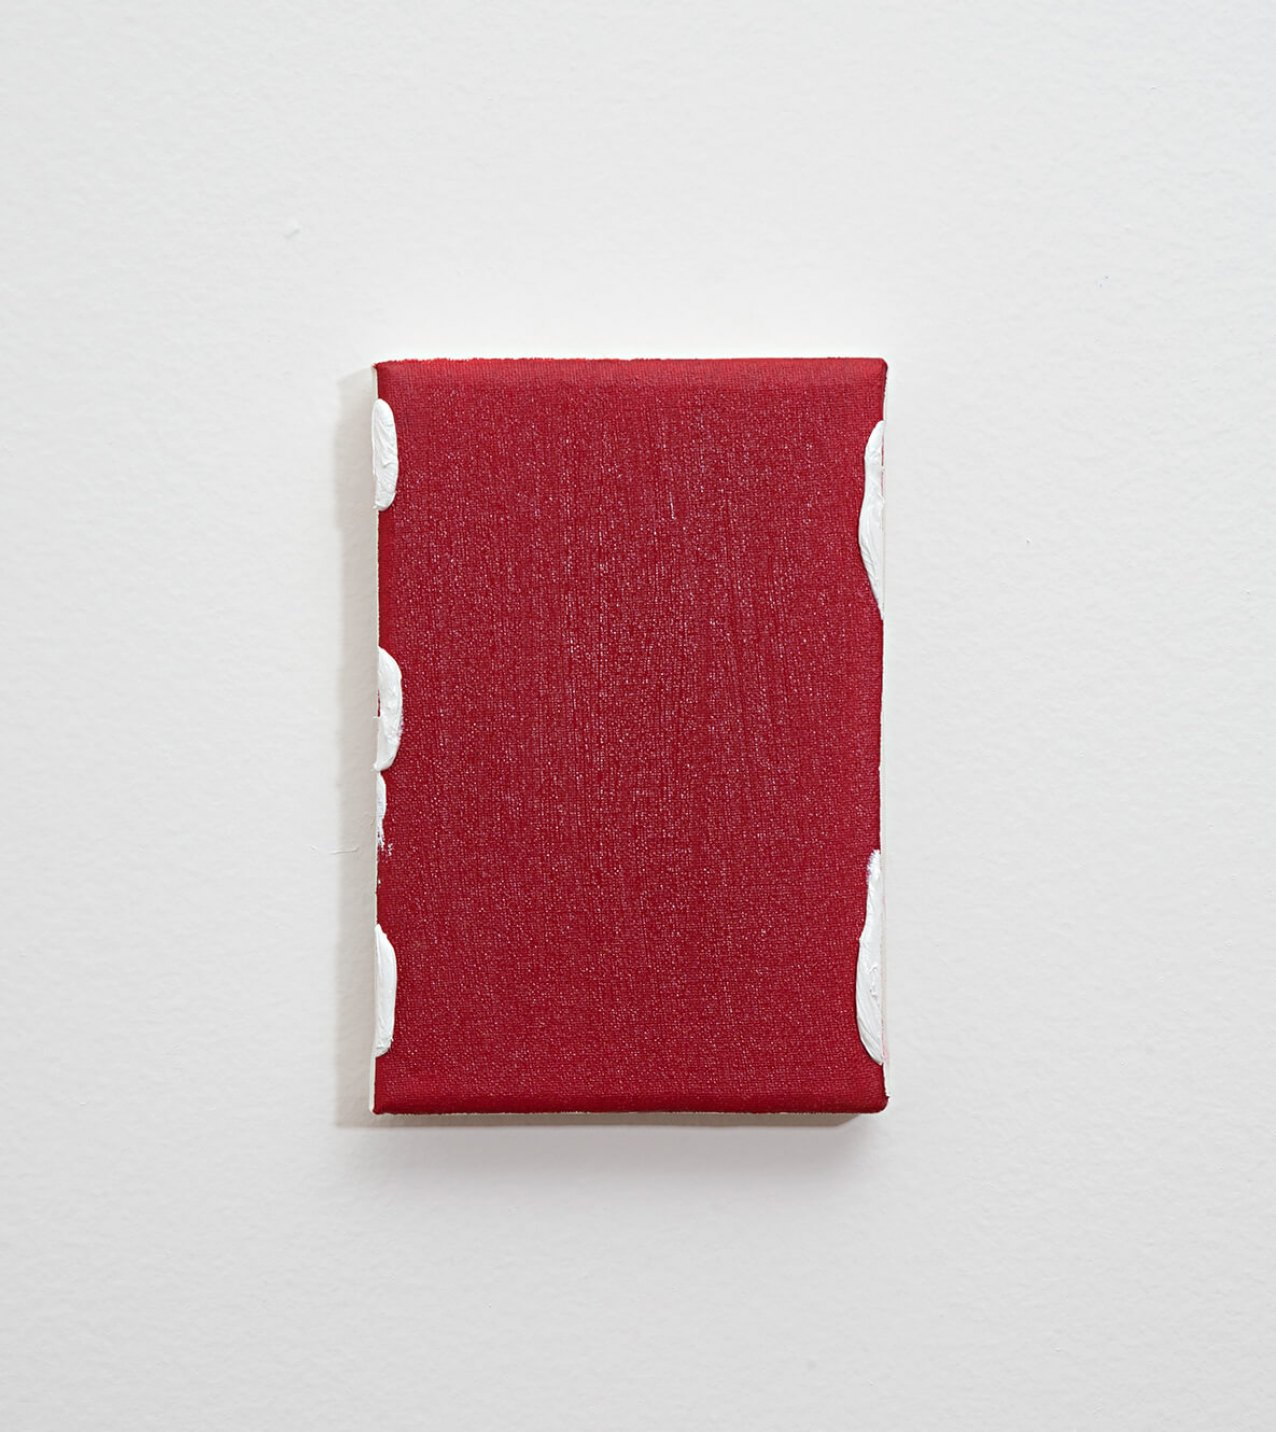 Paulo Monteiro,<em>untitled</em>,2013, oil on canvas, 15 × 10 cm - Mendes Wood DM